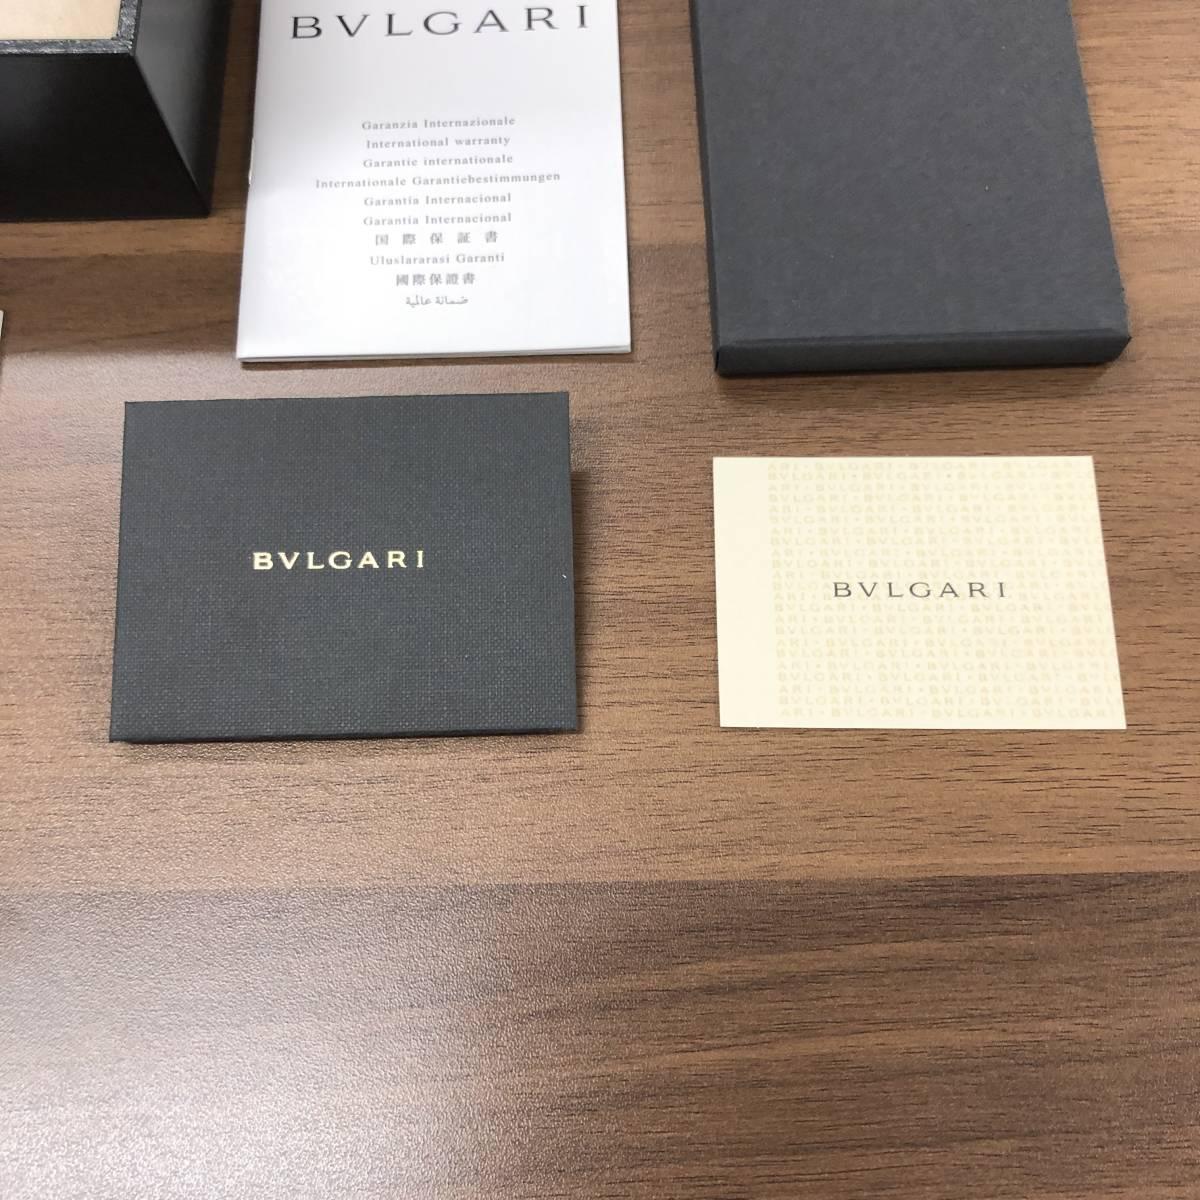 【2459】 BVLGARI ブルガリ 腕時計用ケース 空箱 冊子一式 黒_画像4